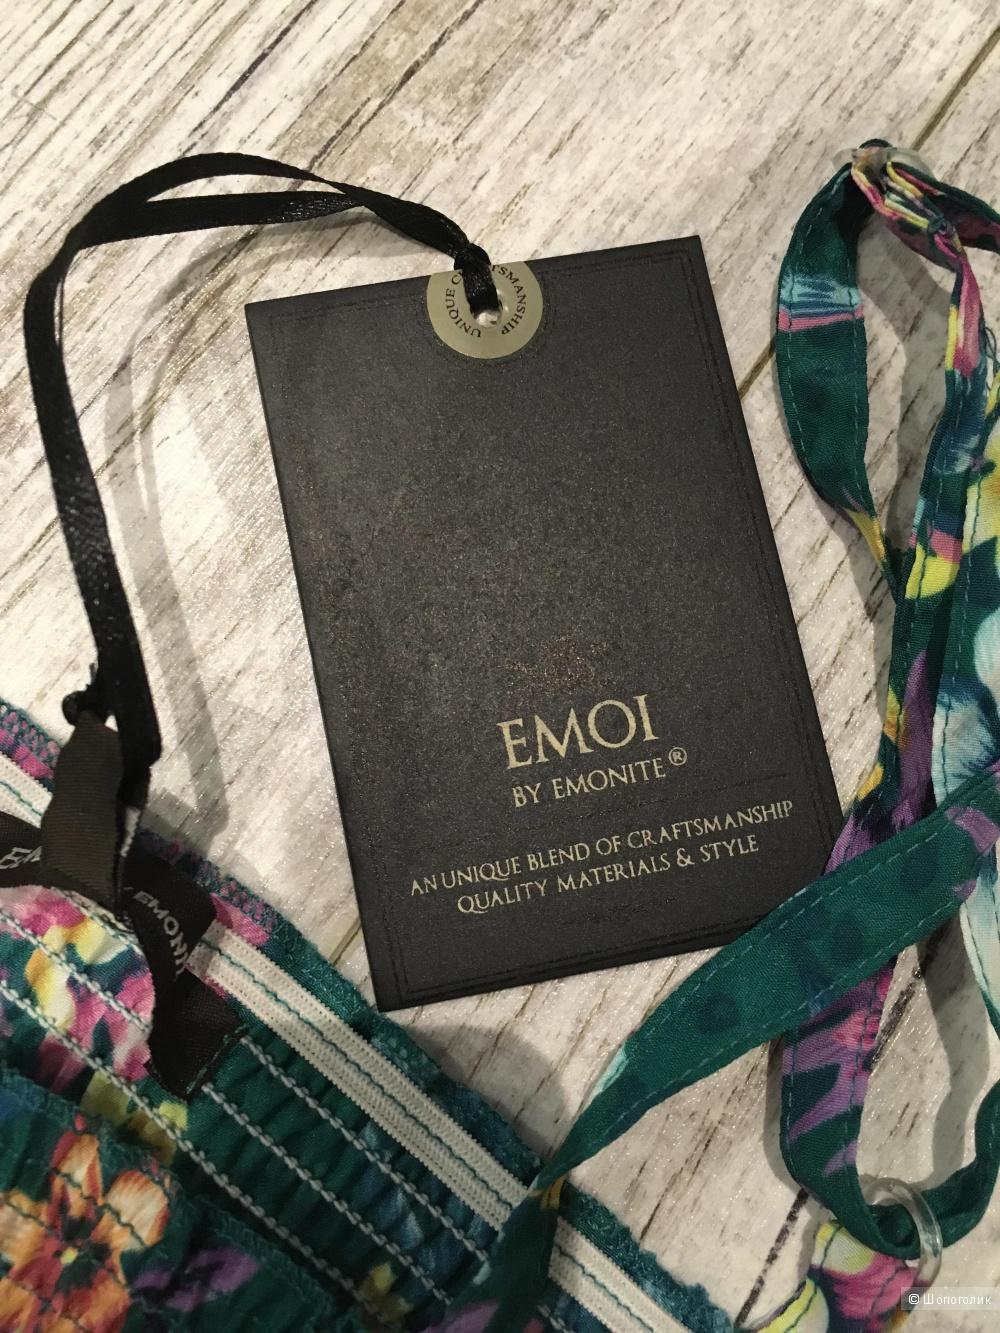 Летний комбинезон Emoi be Emonite, 48-50 размер